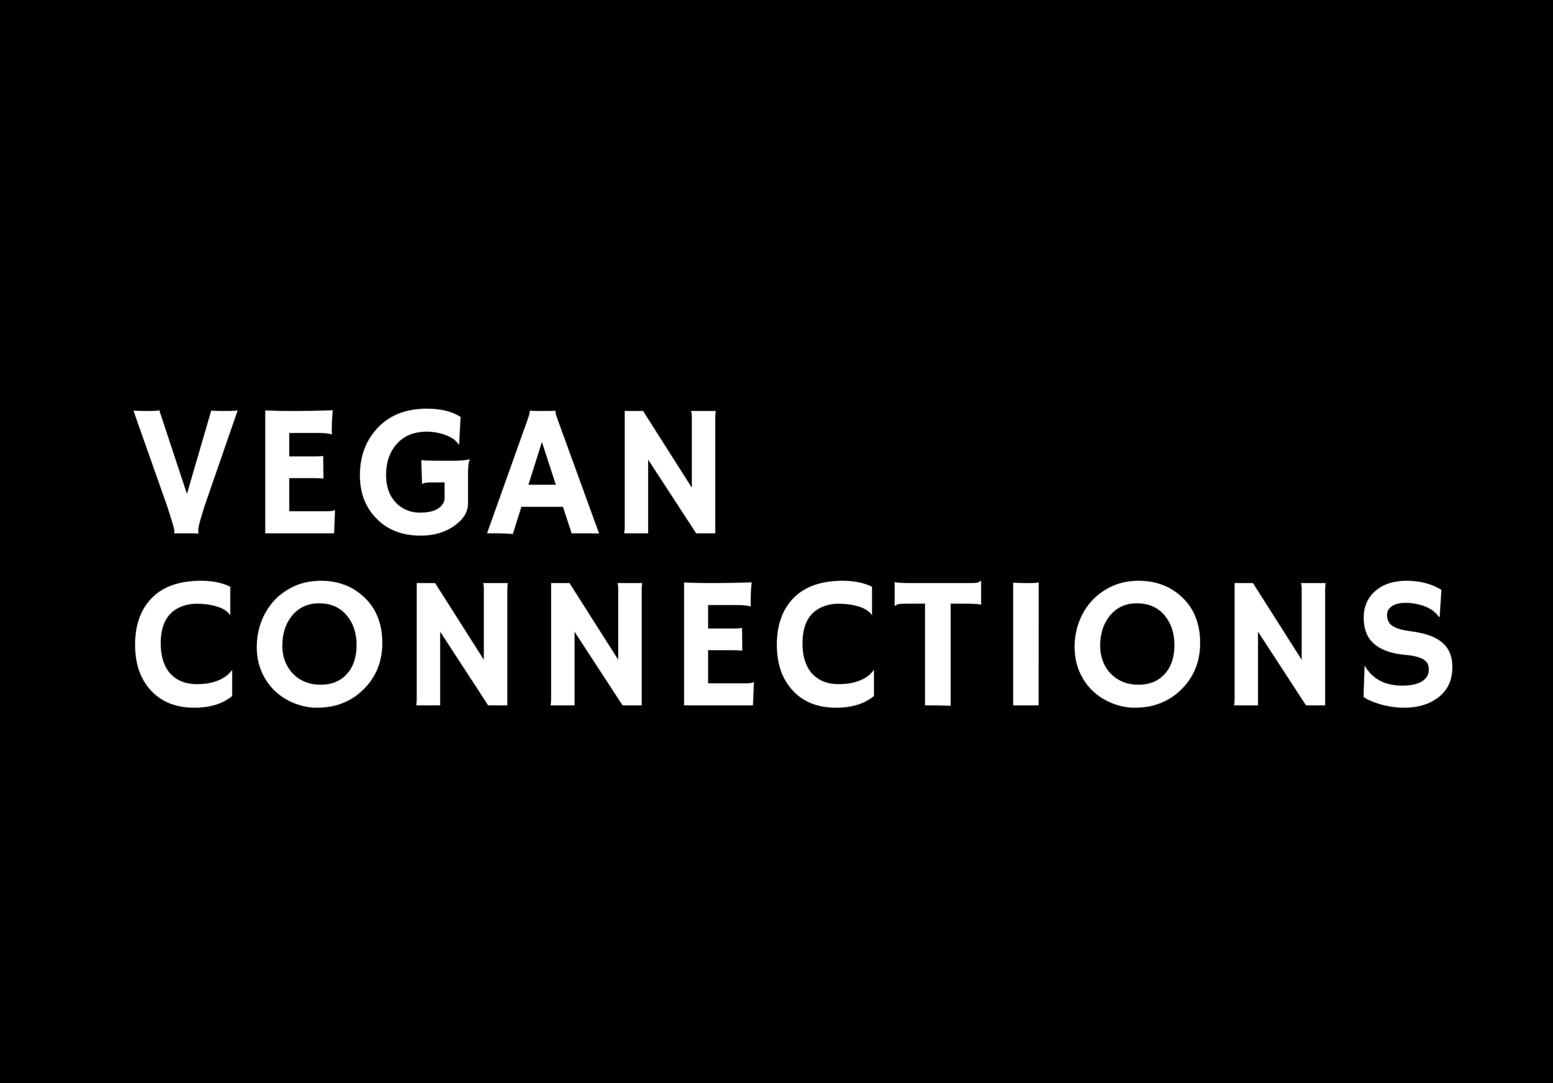 Vegan Connections Logo 01.png